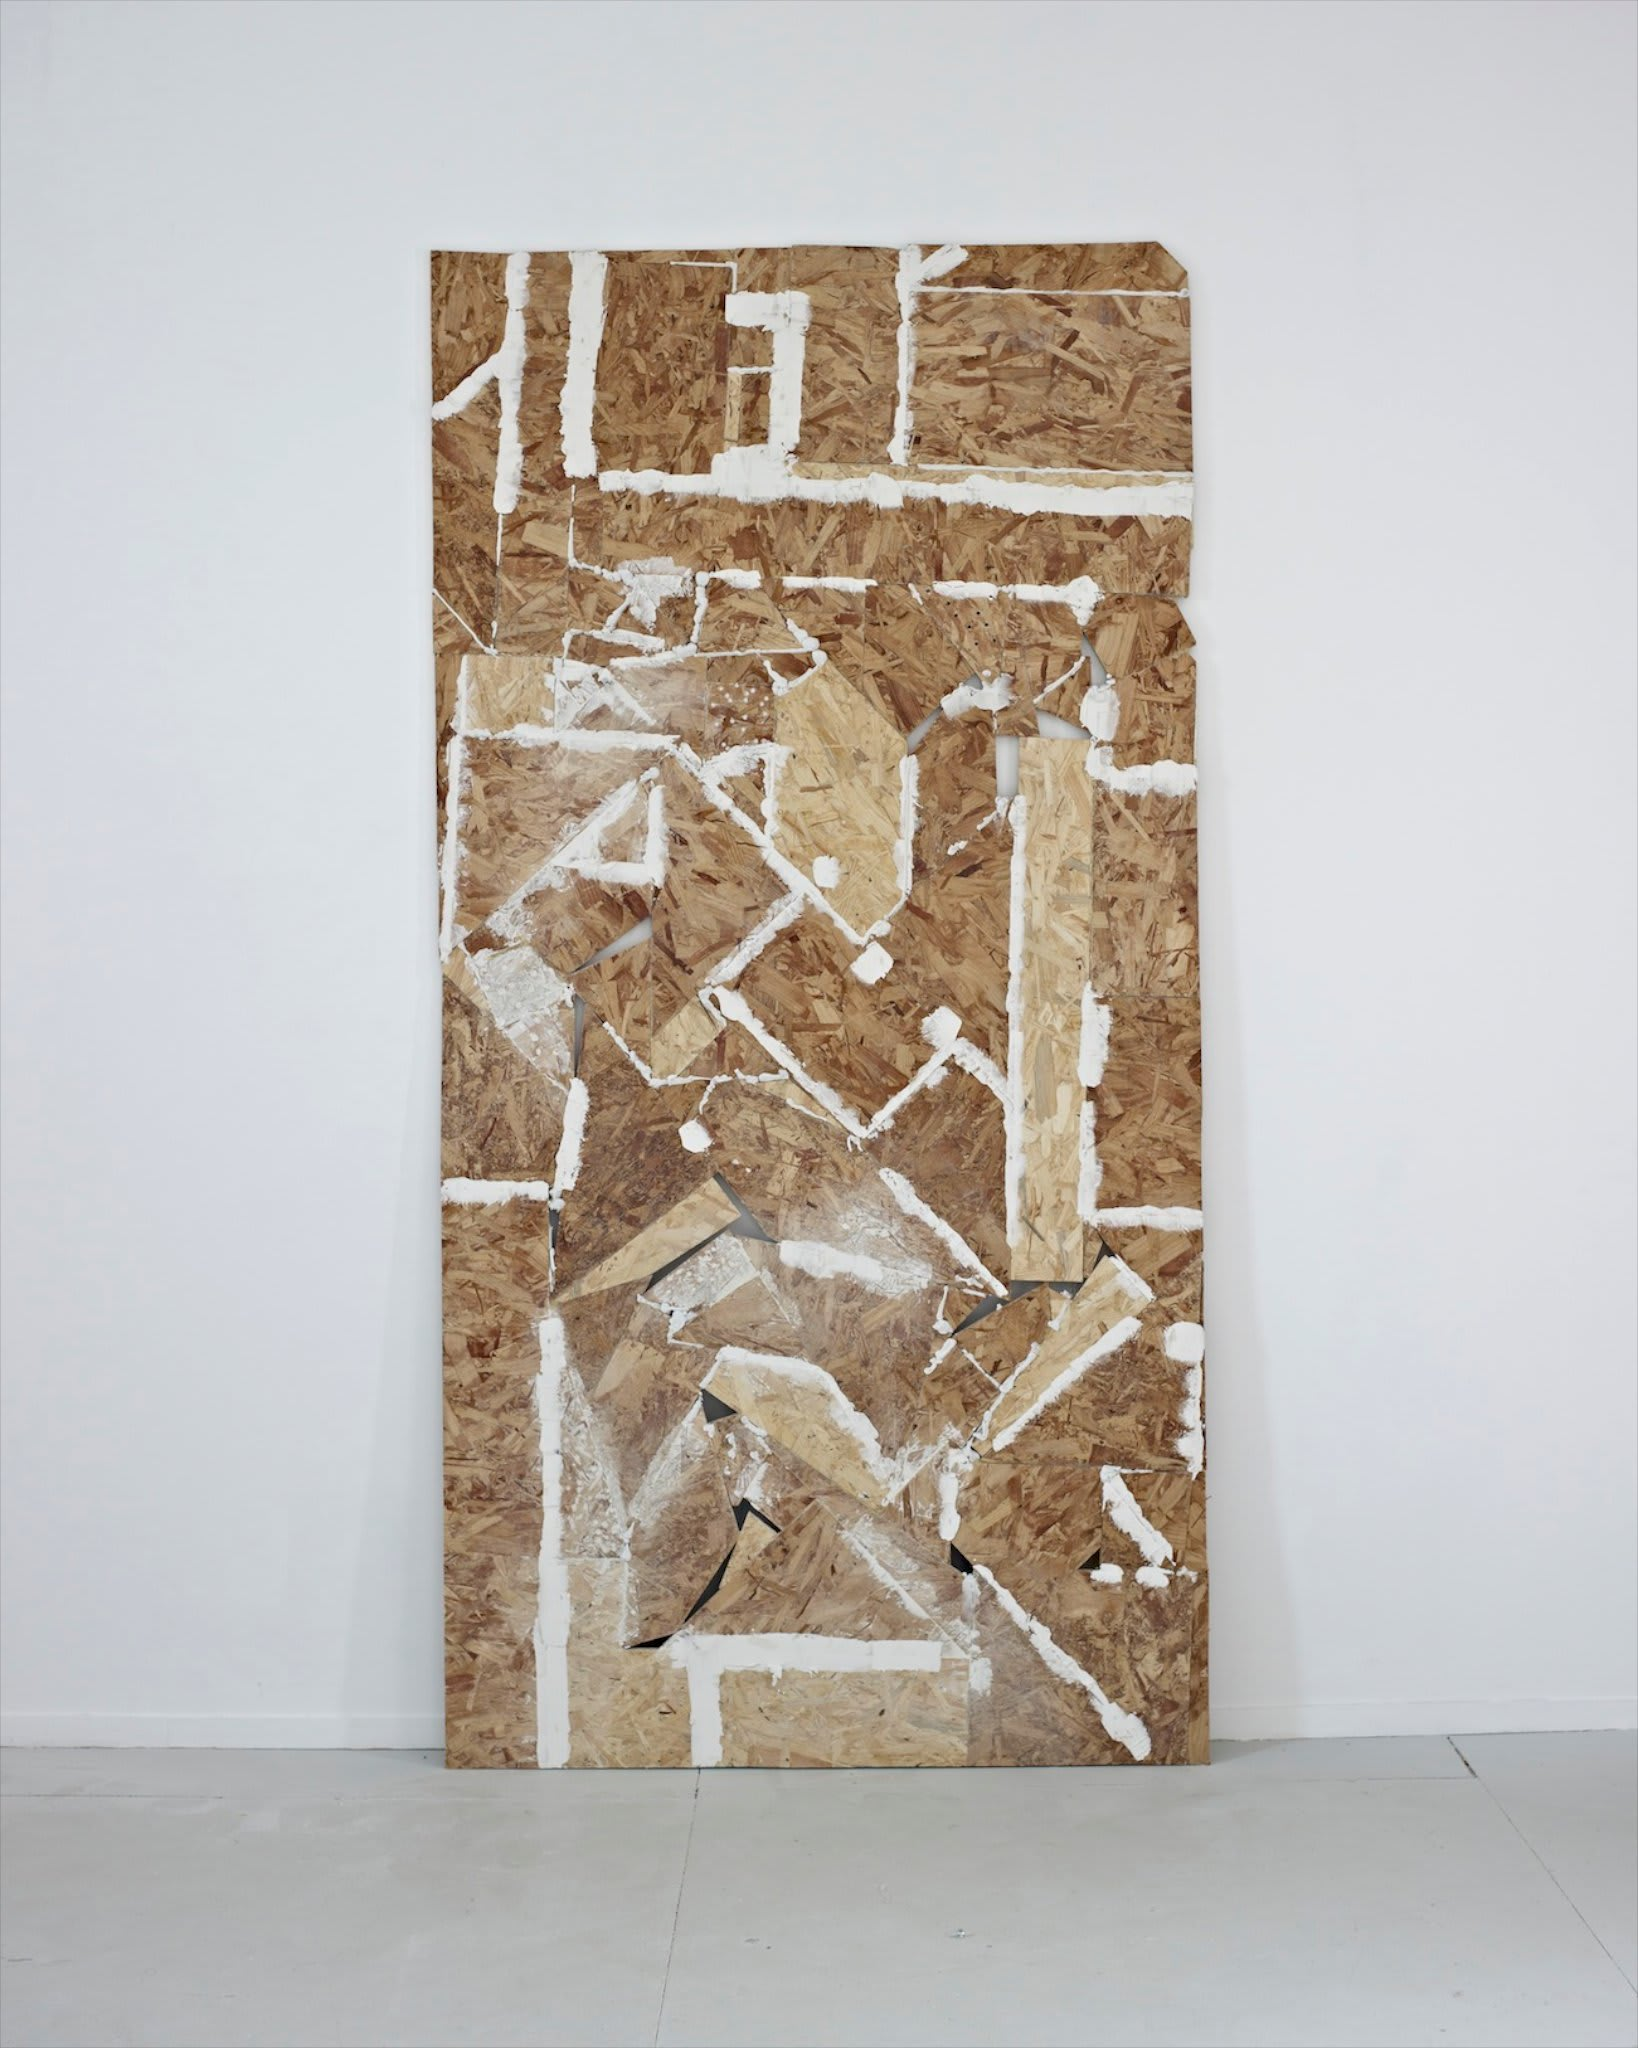 <span class=&#34;link fancybox-details-link&#34;><a href=&#34;/artists/16-paul-merrick/works/8116/&#34;>View Detail Page</a></span><div class=&#34;artist&#34;><strong>Paul Merrick</strong></div> <div class=&#34;title&#34;><em>Untitled (OSB)</em>, 2013</div> <div class=&#34;medium&#34;>Sterling board, filler, glue, chalk</div> <div class=&#34;dimensions&#34;>240 x 122 cm<br />94 1/2 x 48 1/8 in</div><div class=&#34;copyright_line&#34;>Copyright The Artist</div>